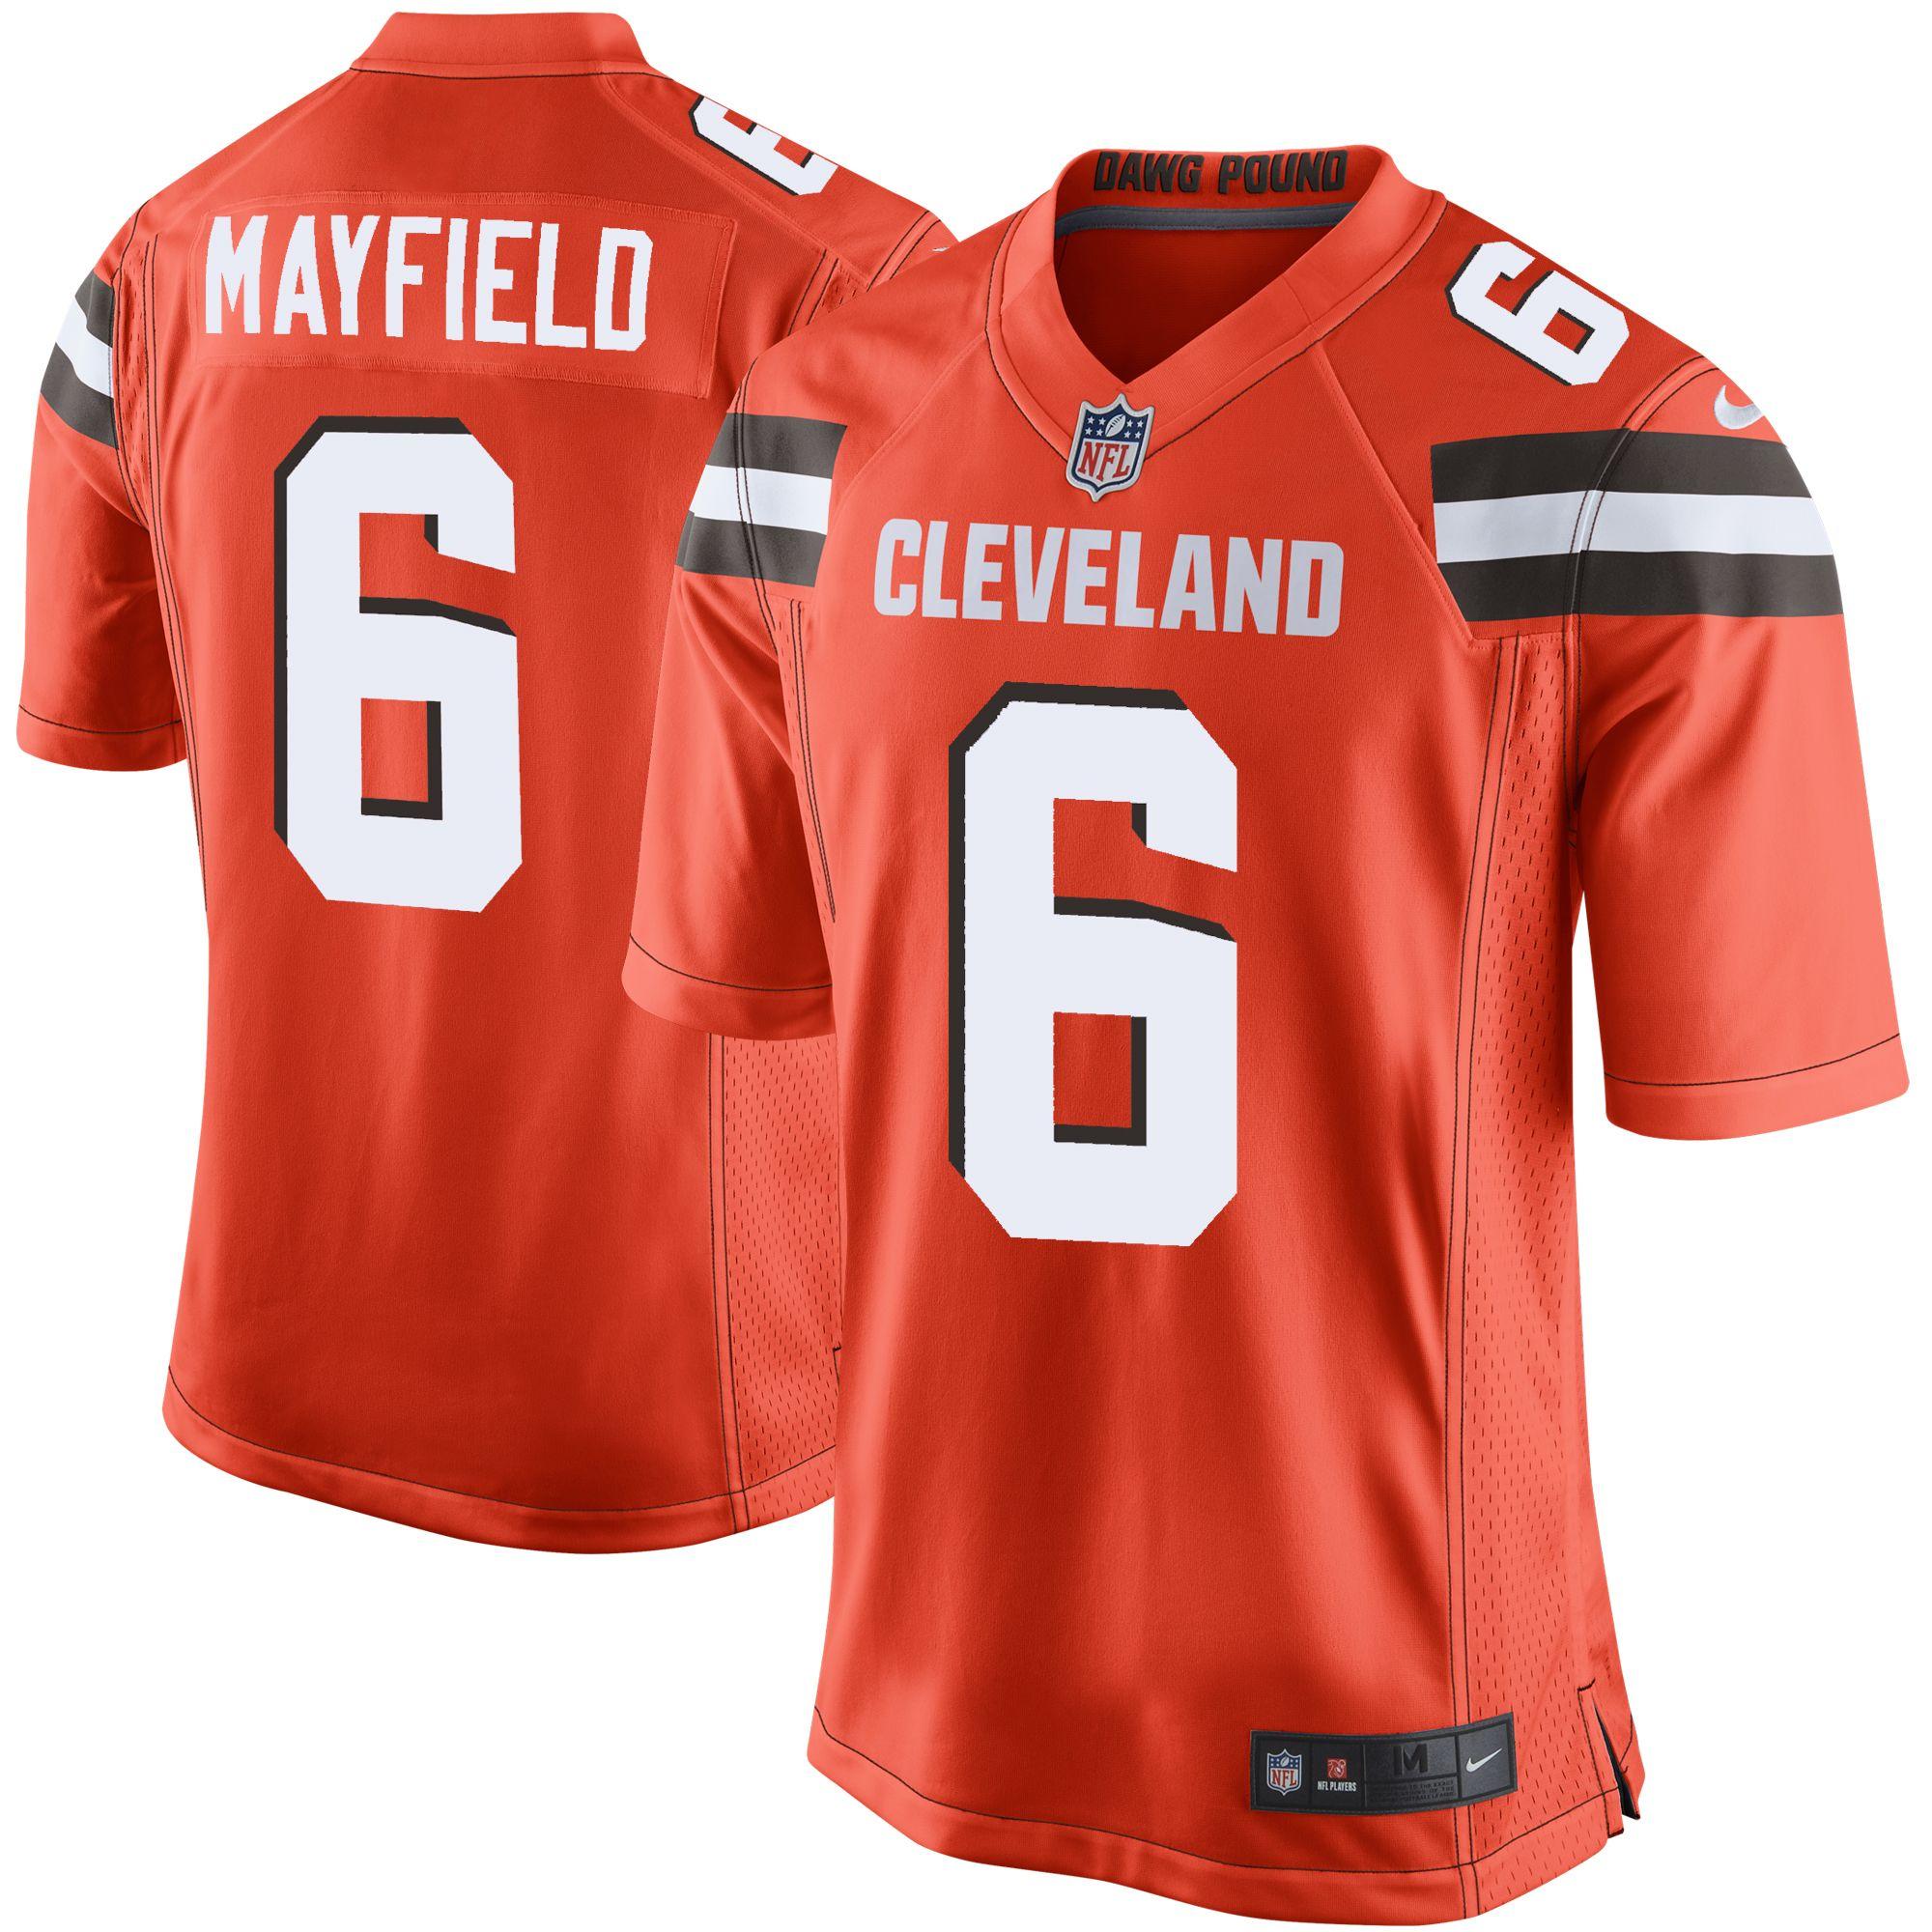 baker mayfield jersey large